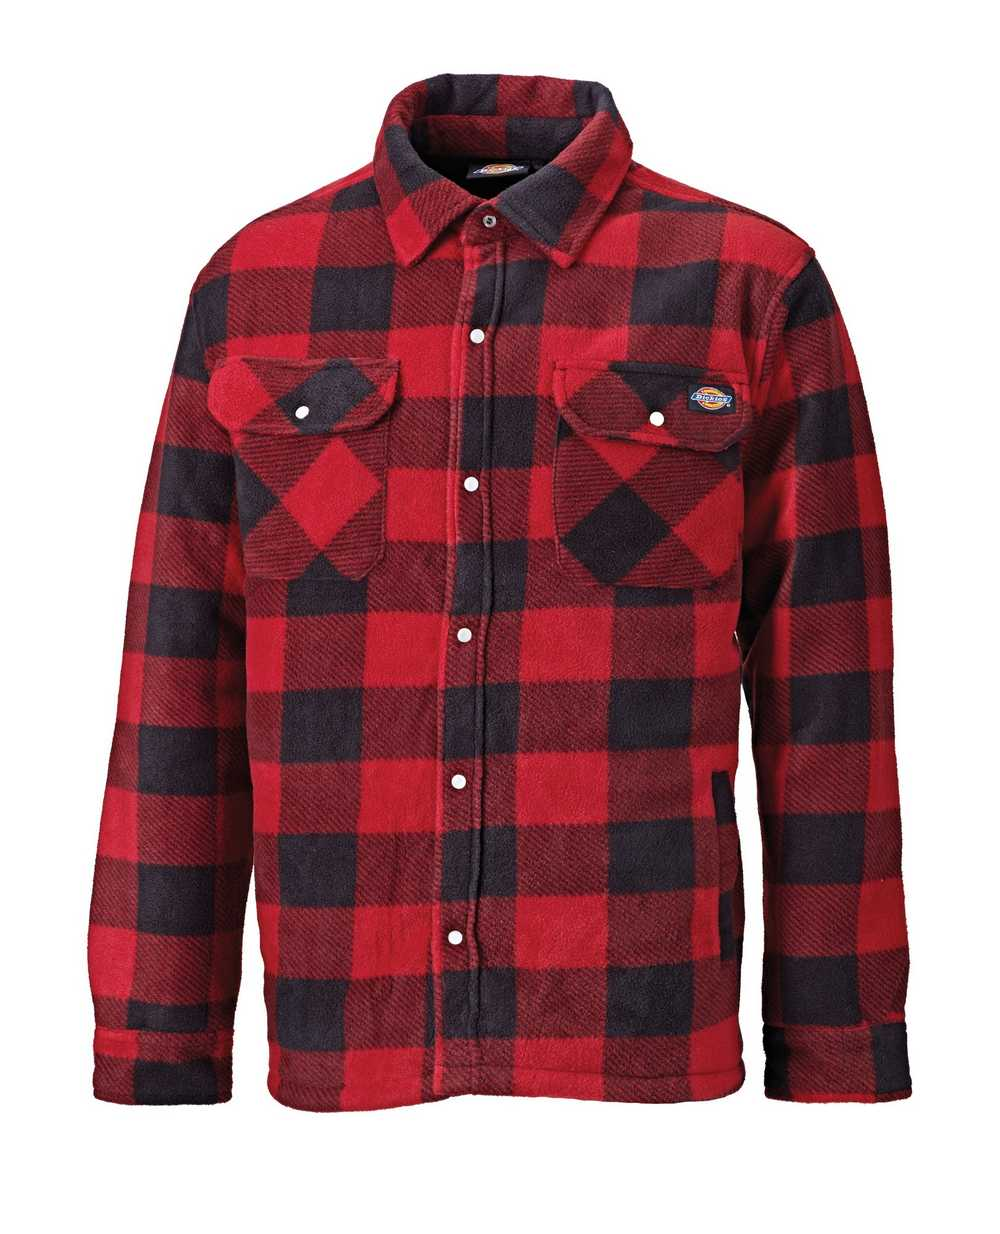 Portland Shirt Red XLrge